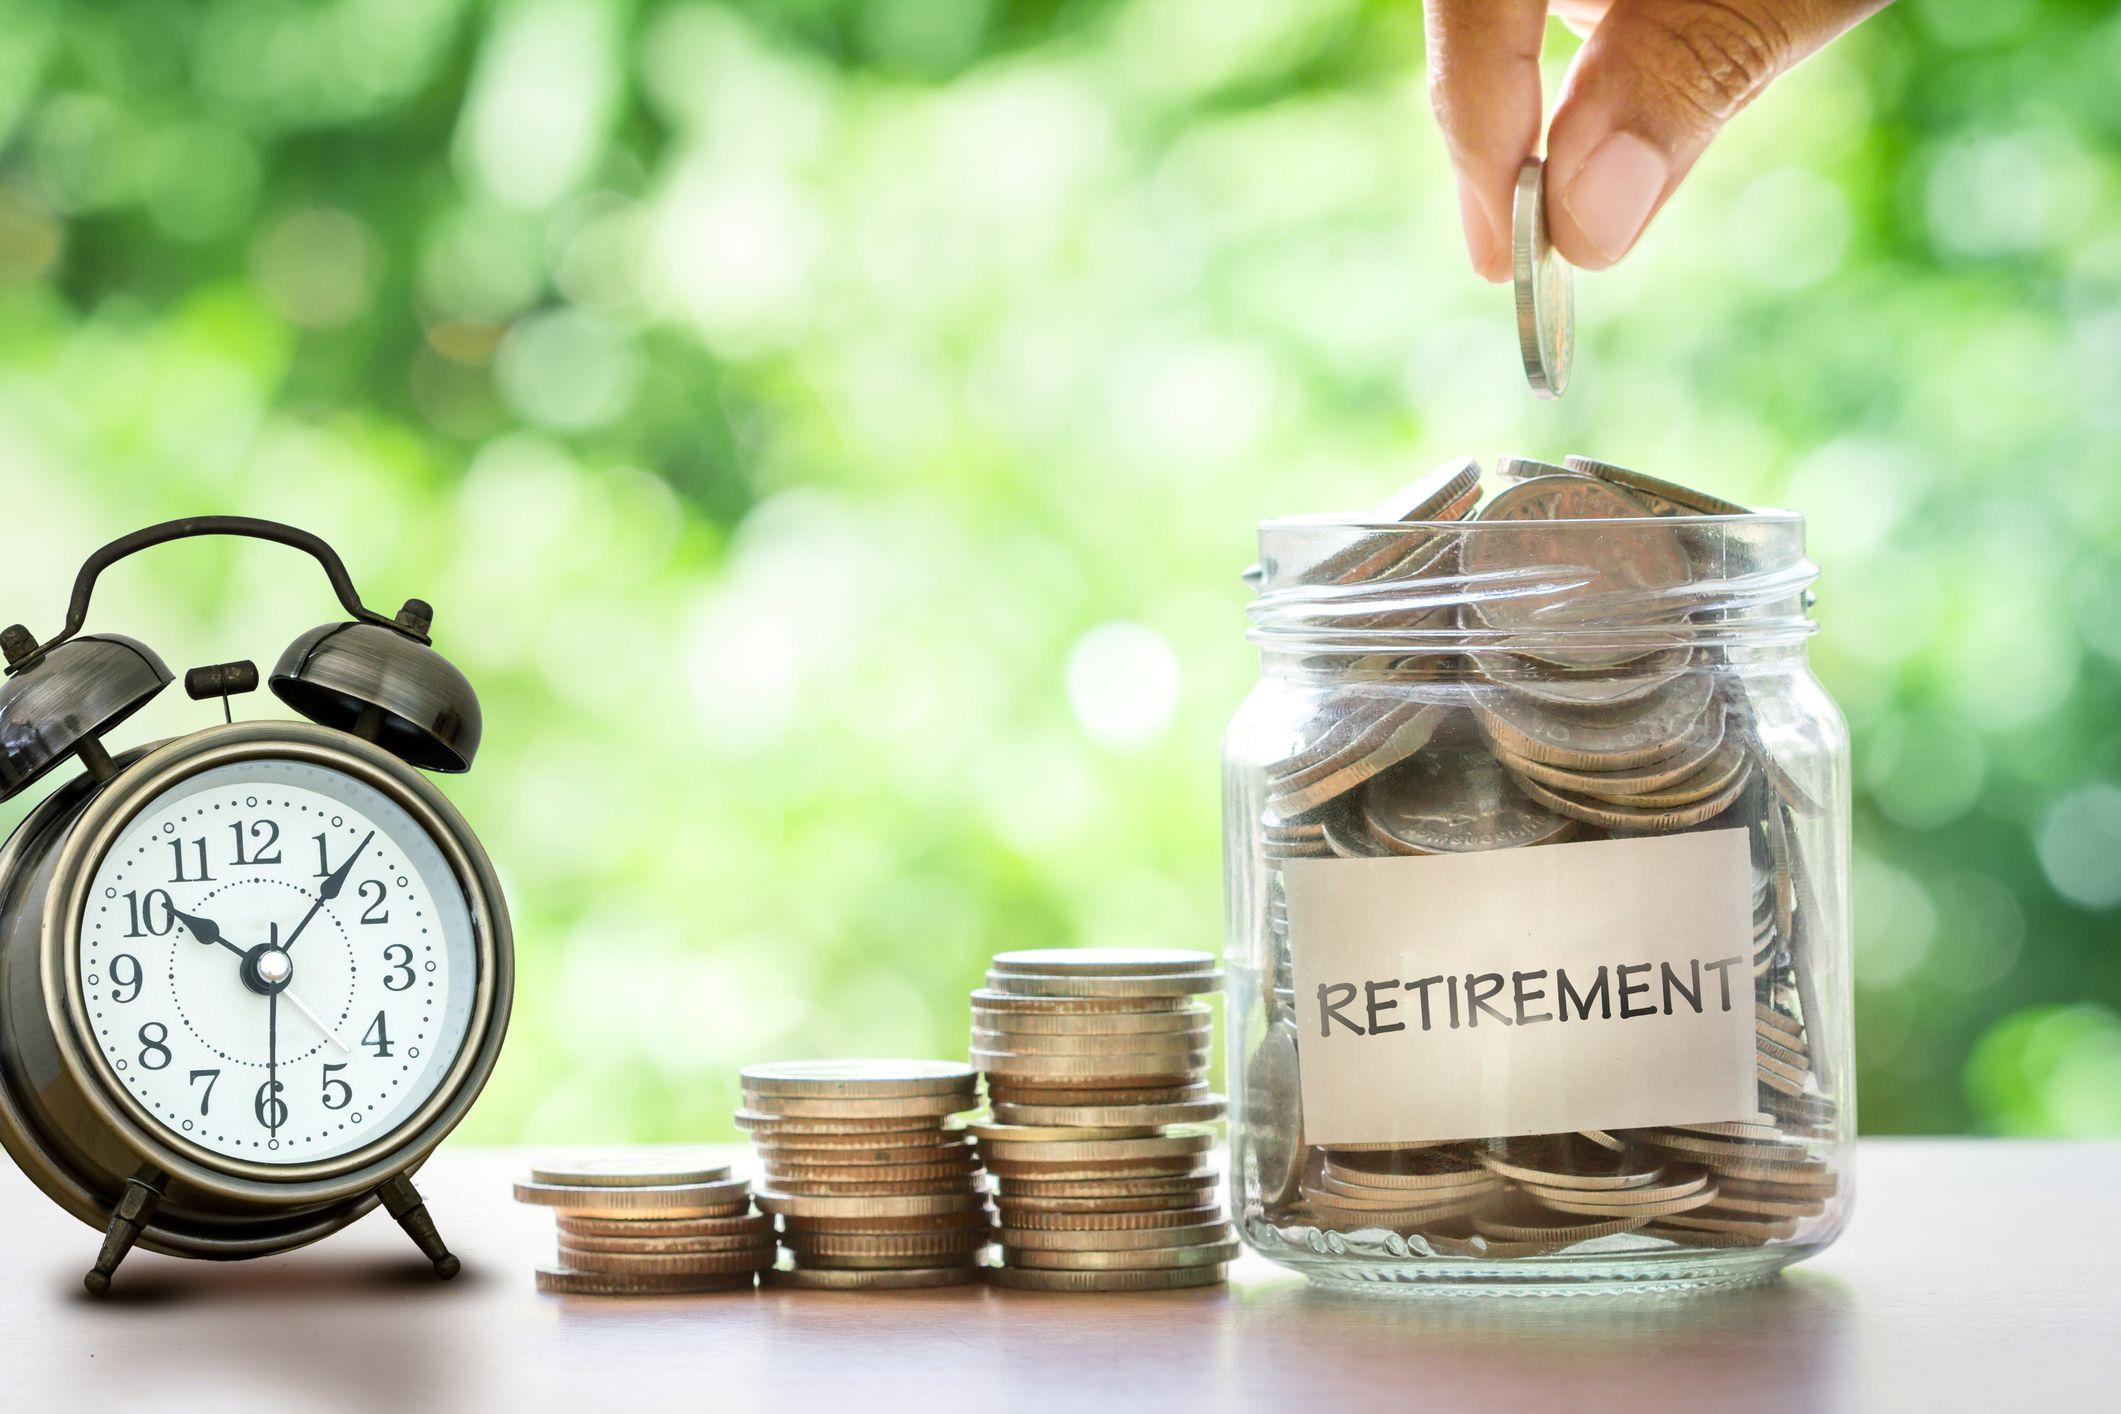 Retirement jar full of coins beside clock